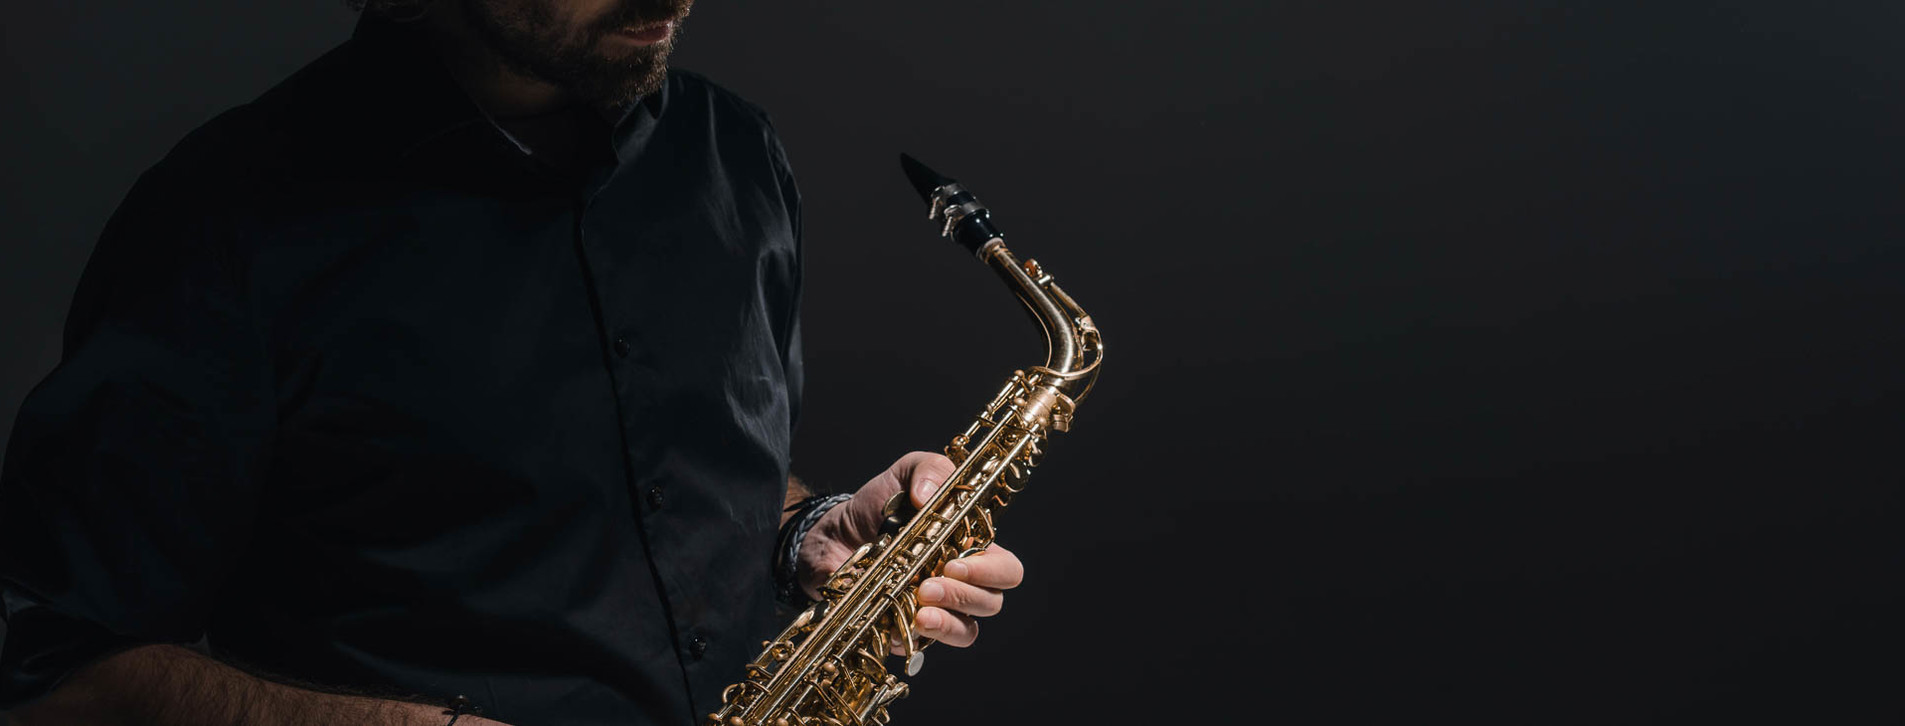 Фото - Мастер-класс игры на саксофоне